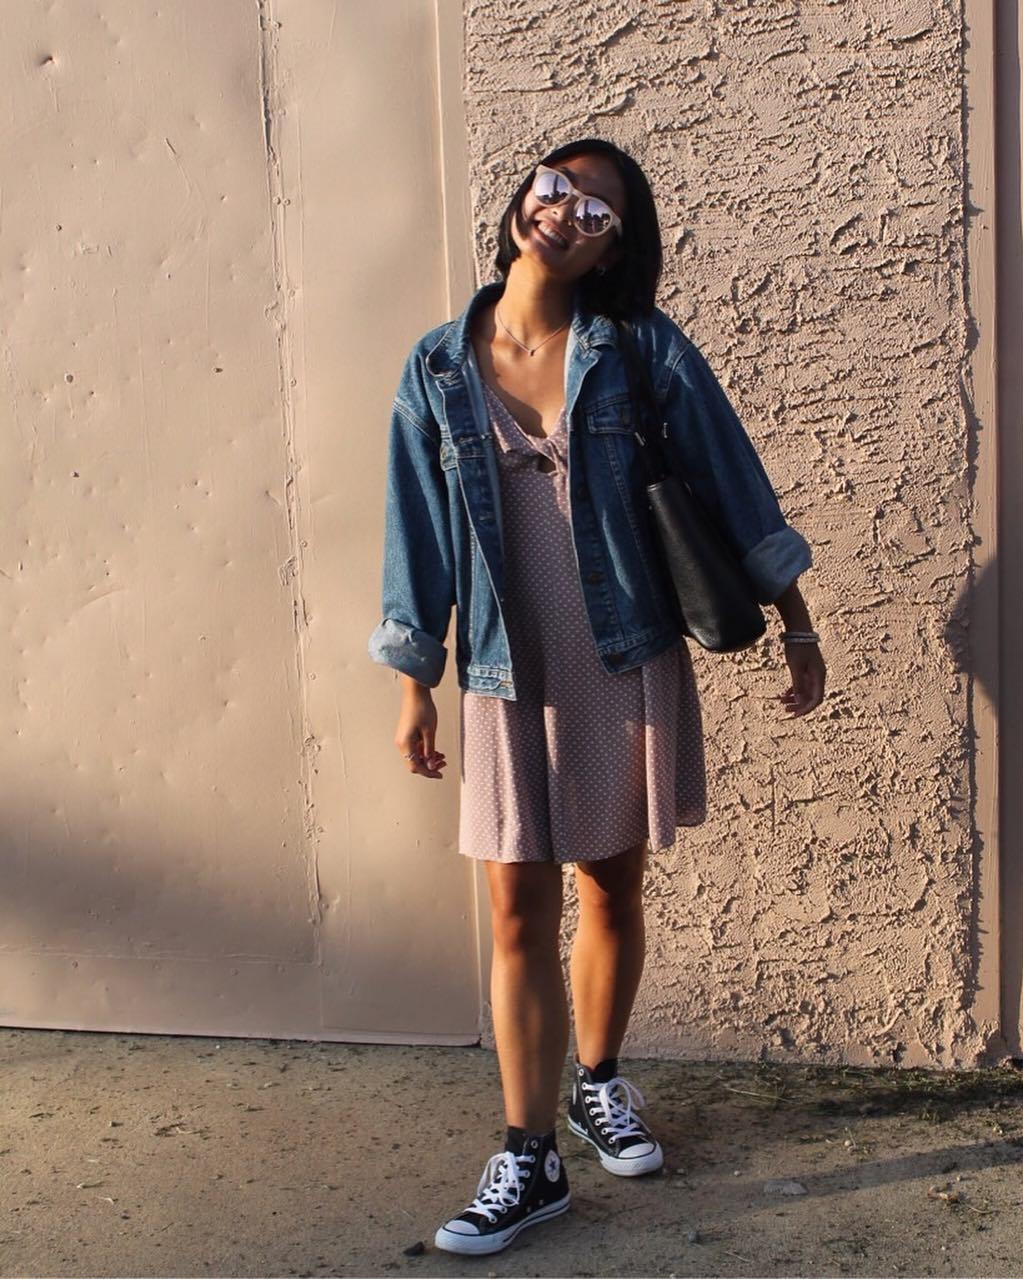 dress and denim jacket look